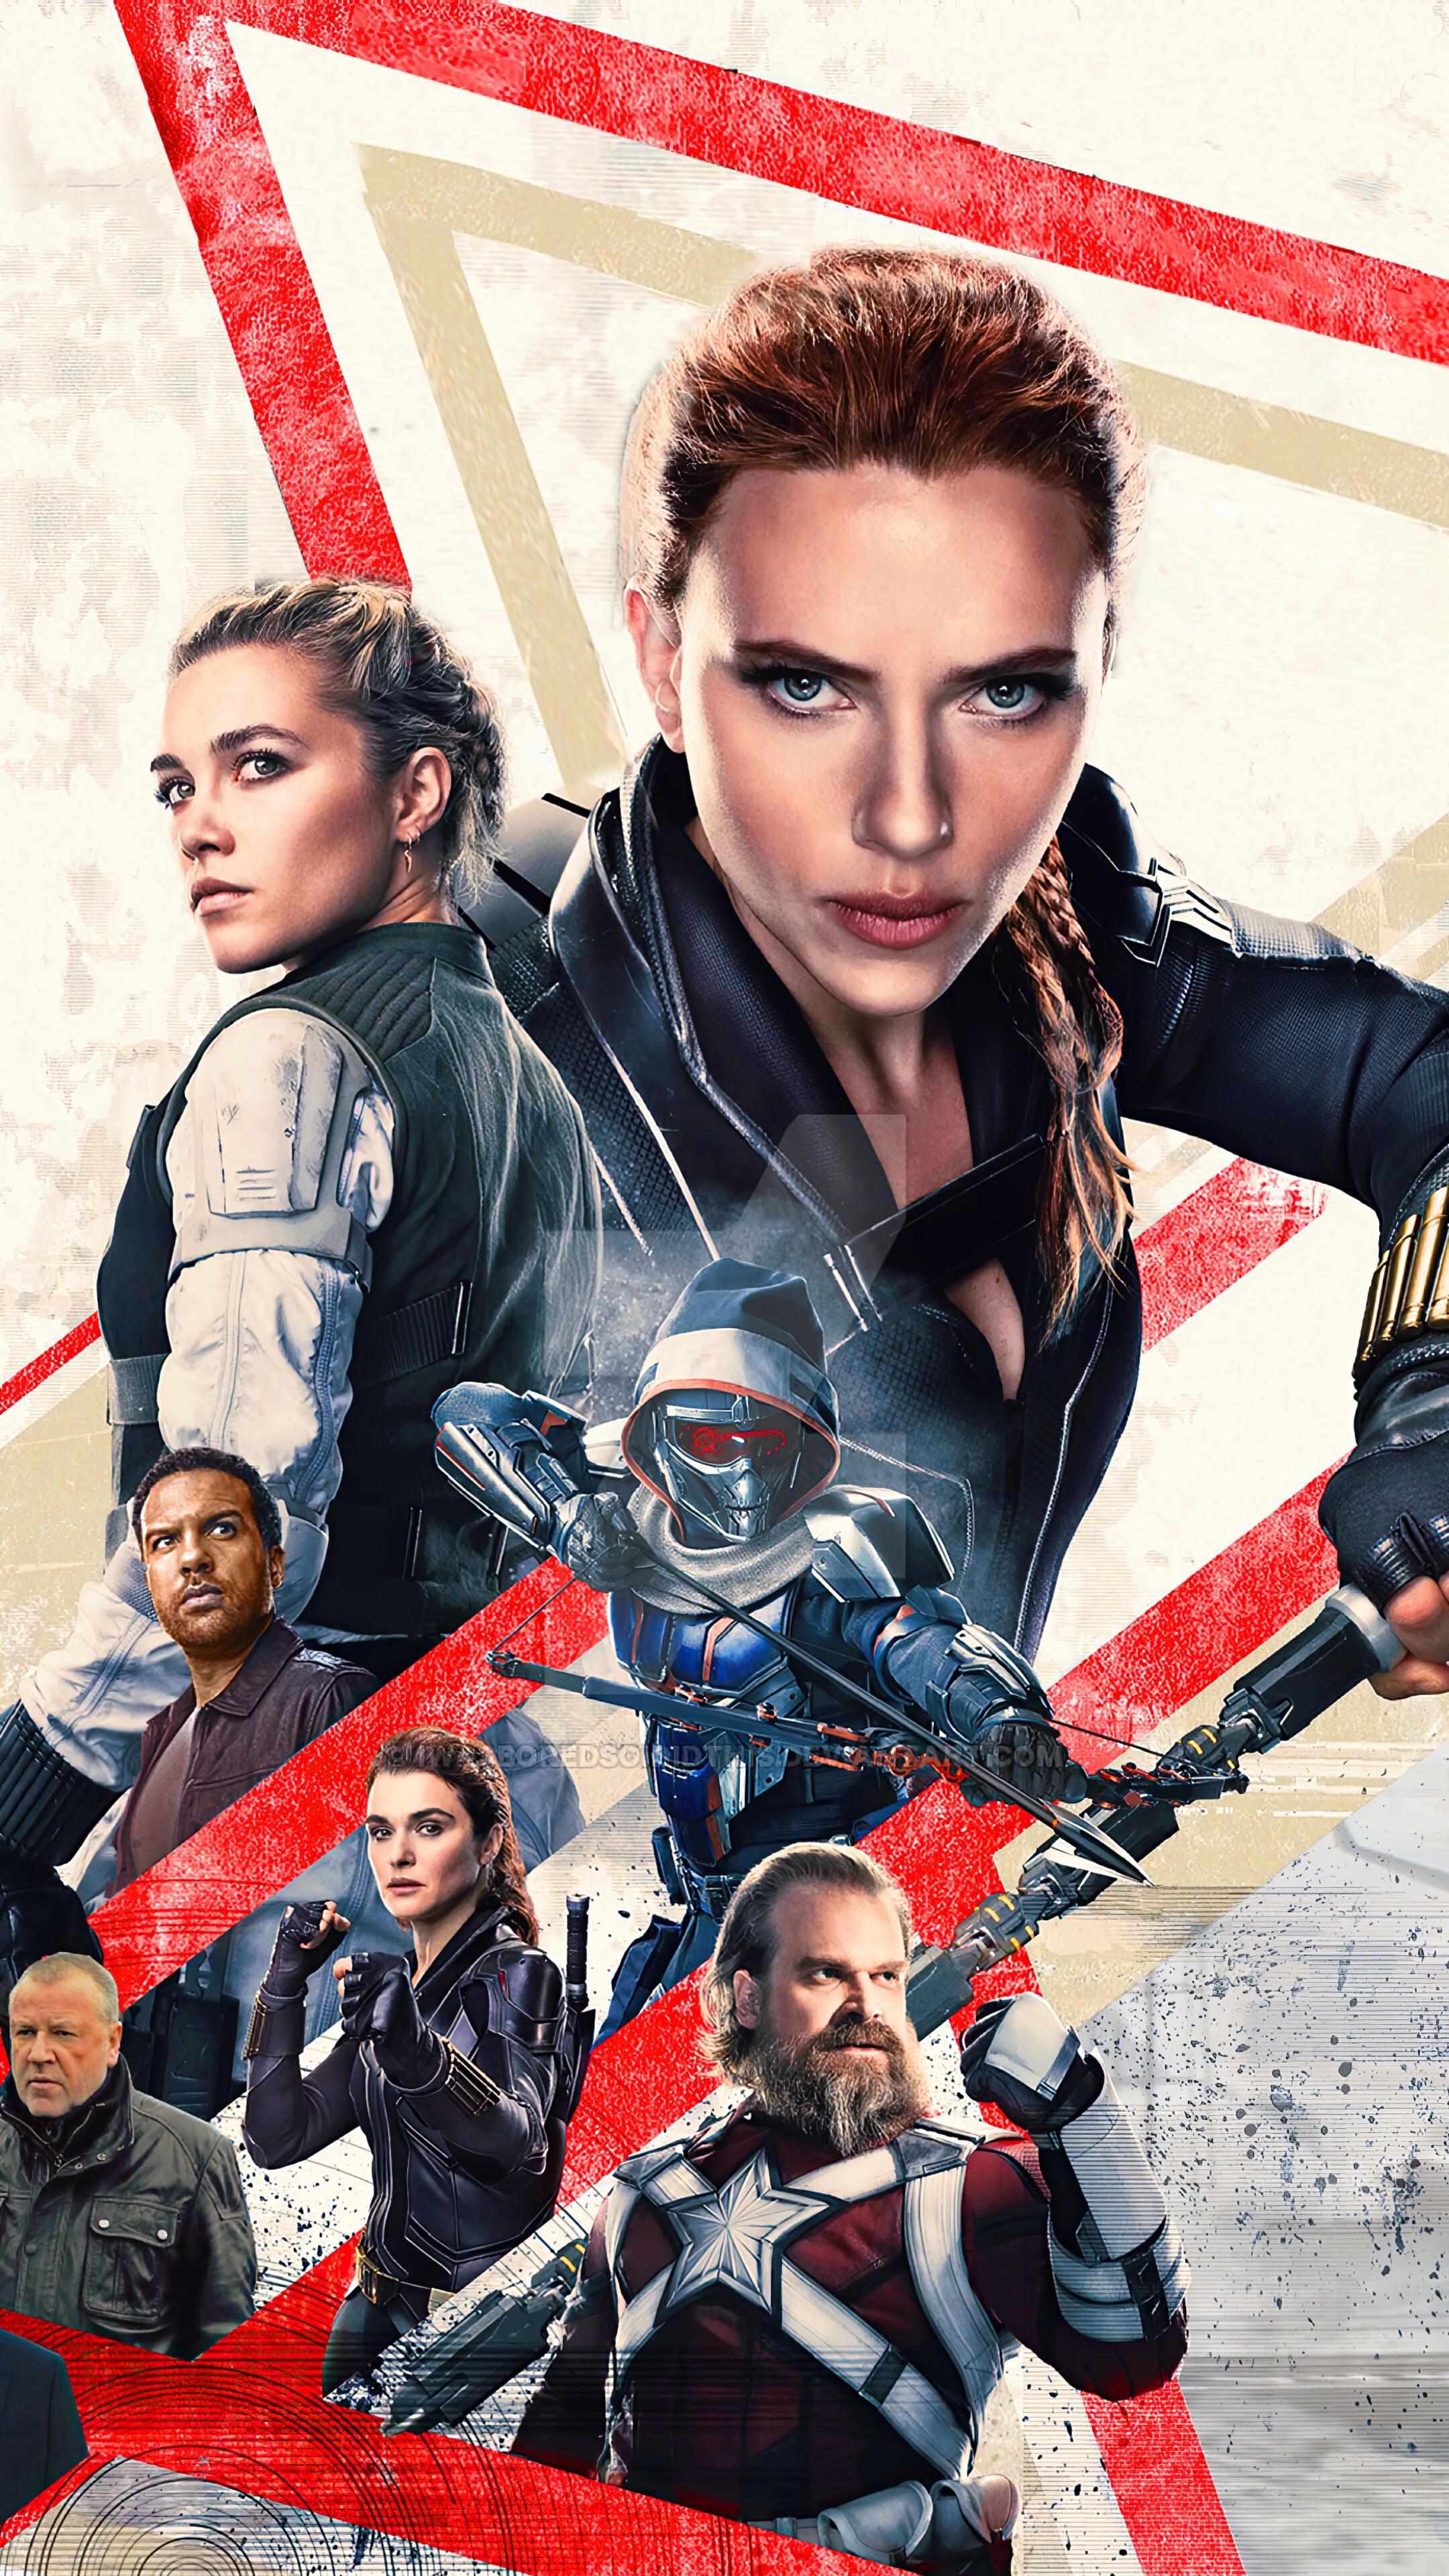 Black Widow 2021 Movie Poster HD 4K Wallpaper 82260 2160x3840